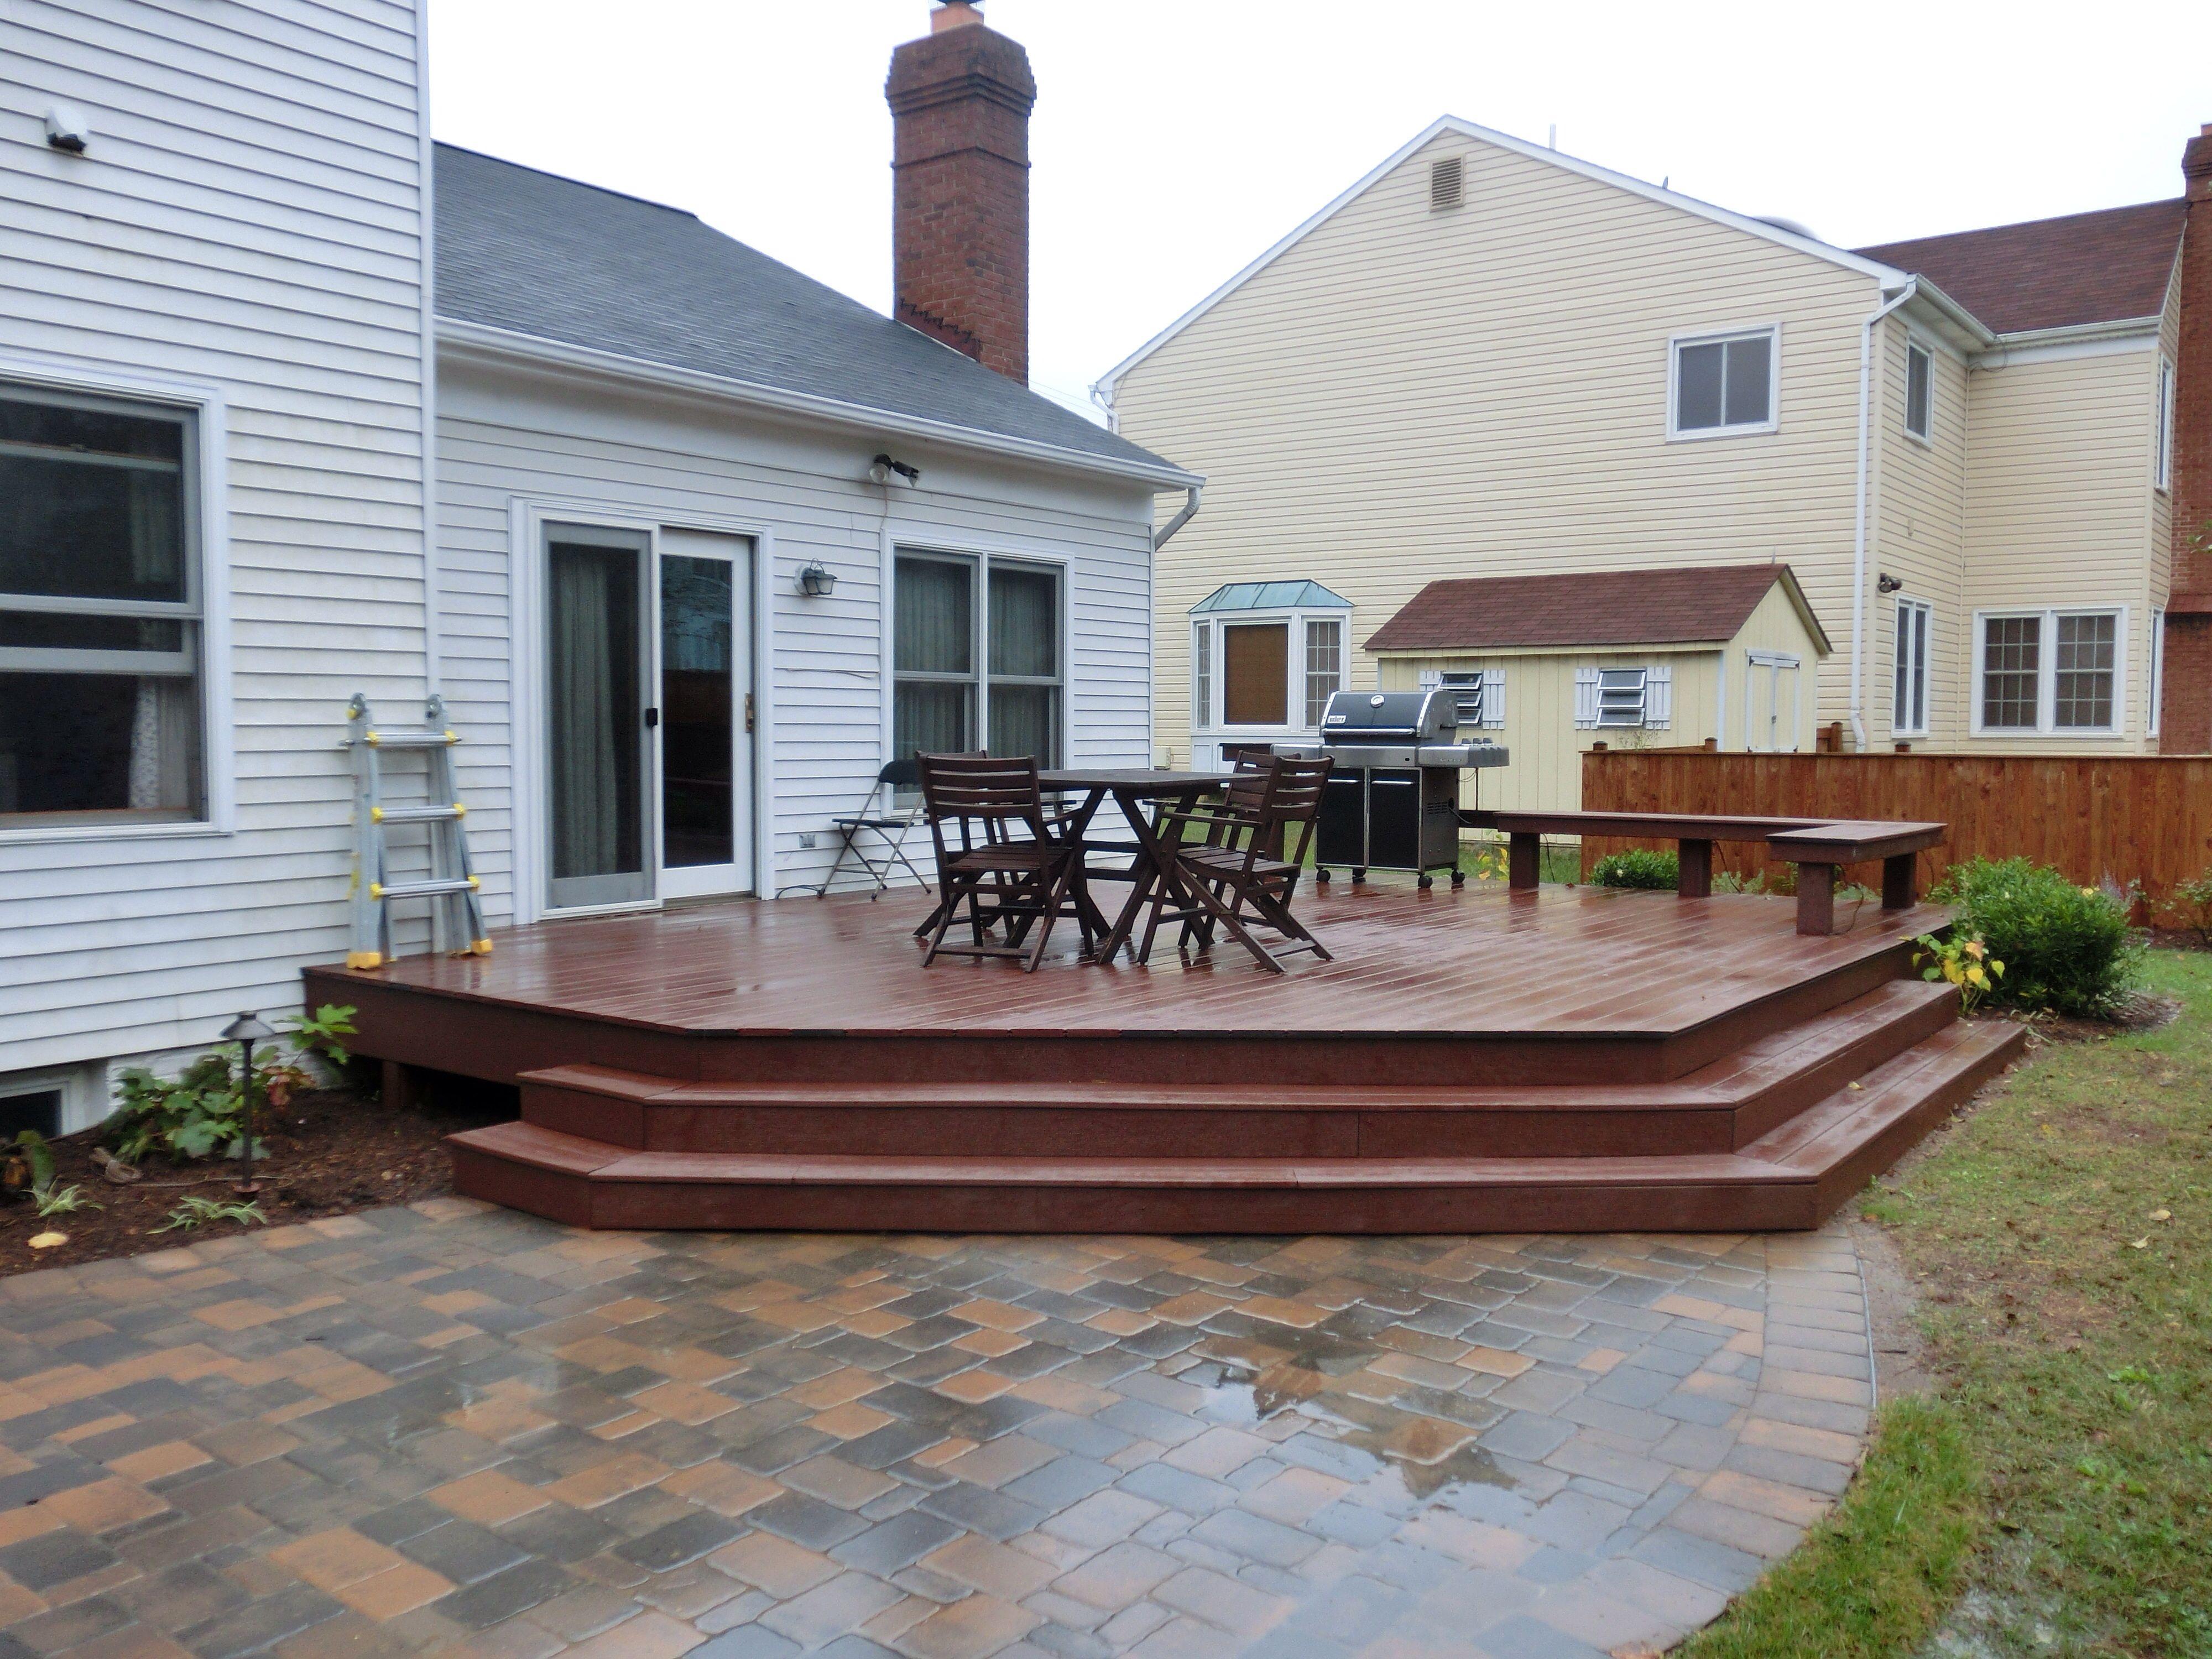 Composite Deck With Paver Patio Deck Designs Backyard Patio